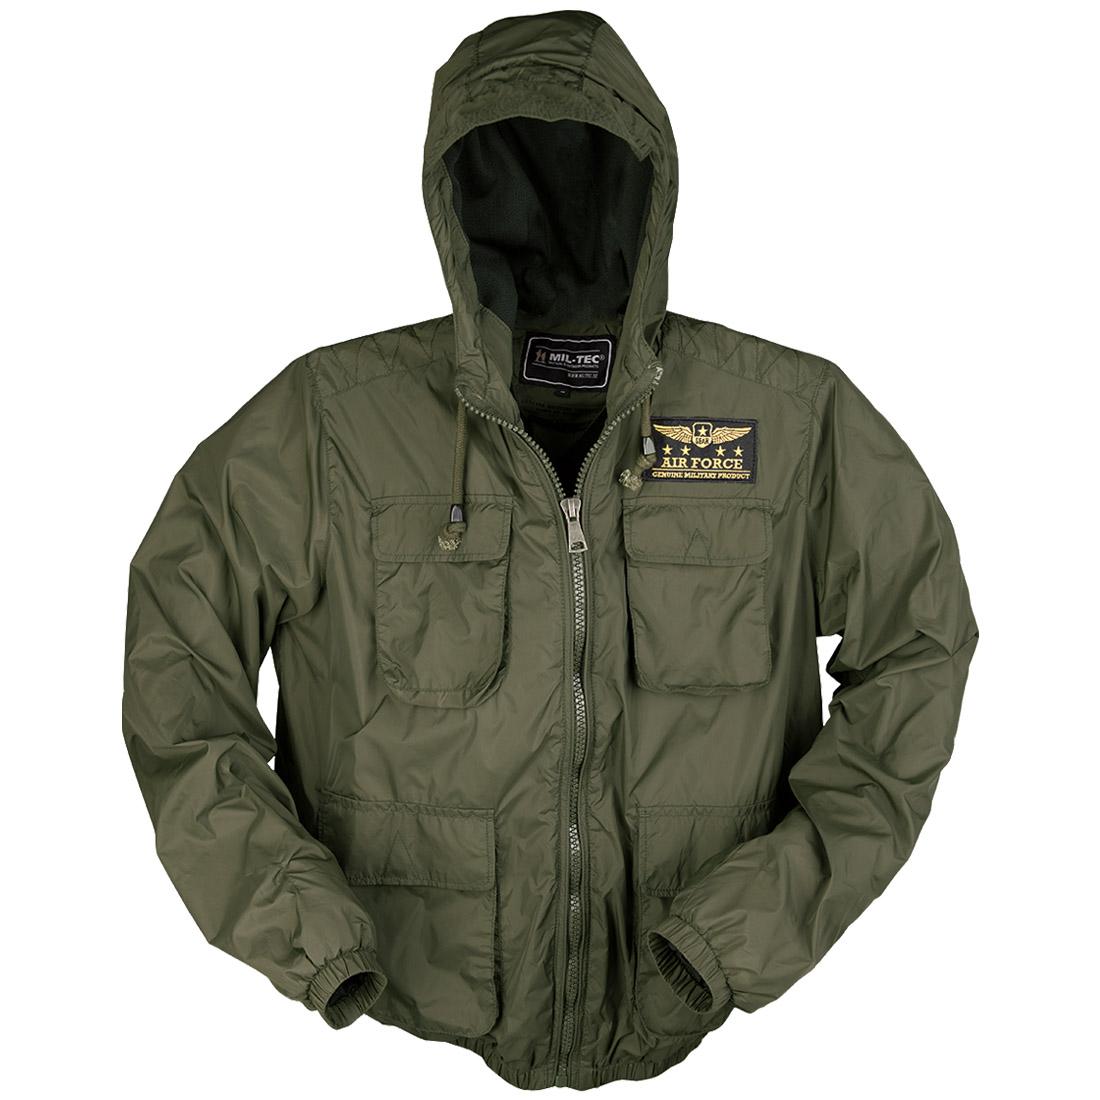 Mil-Tec Tactical Air Force Summer Mens Jacket Military Pilot Hooded Coat Olive